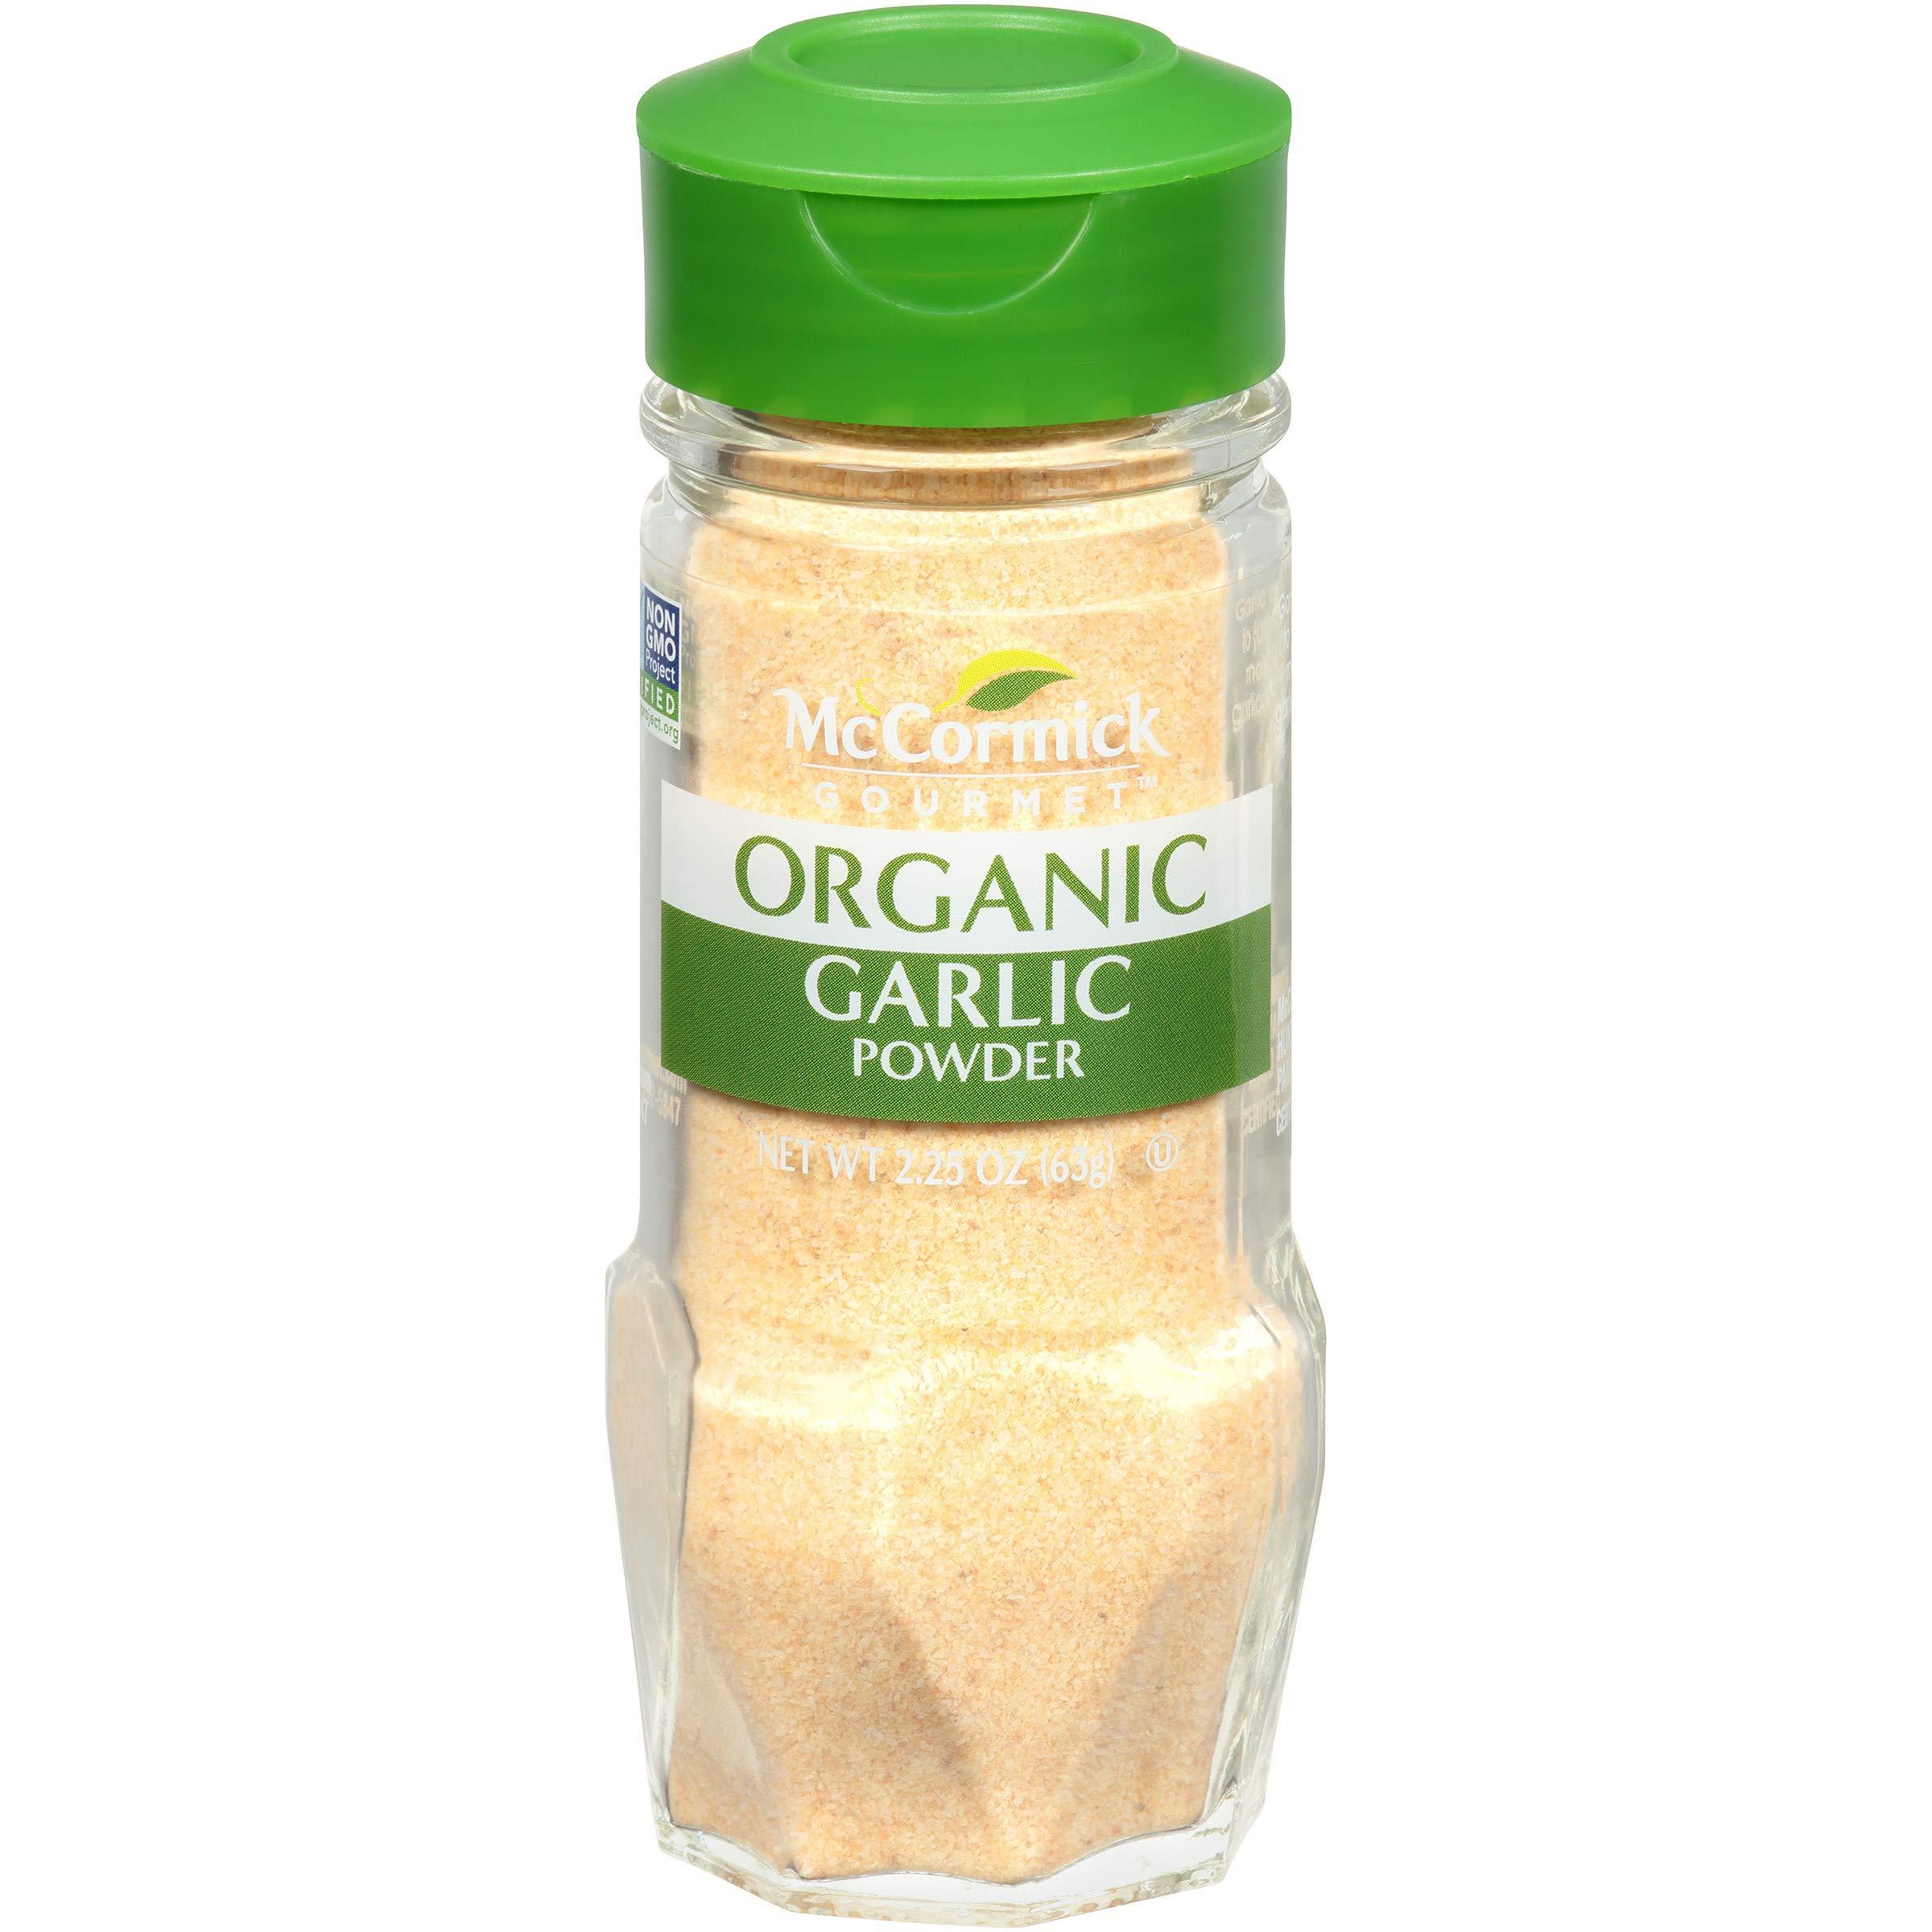 McCormick Gourmet, Garlic Powder, 2.25 oz